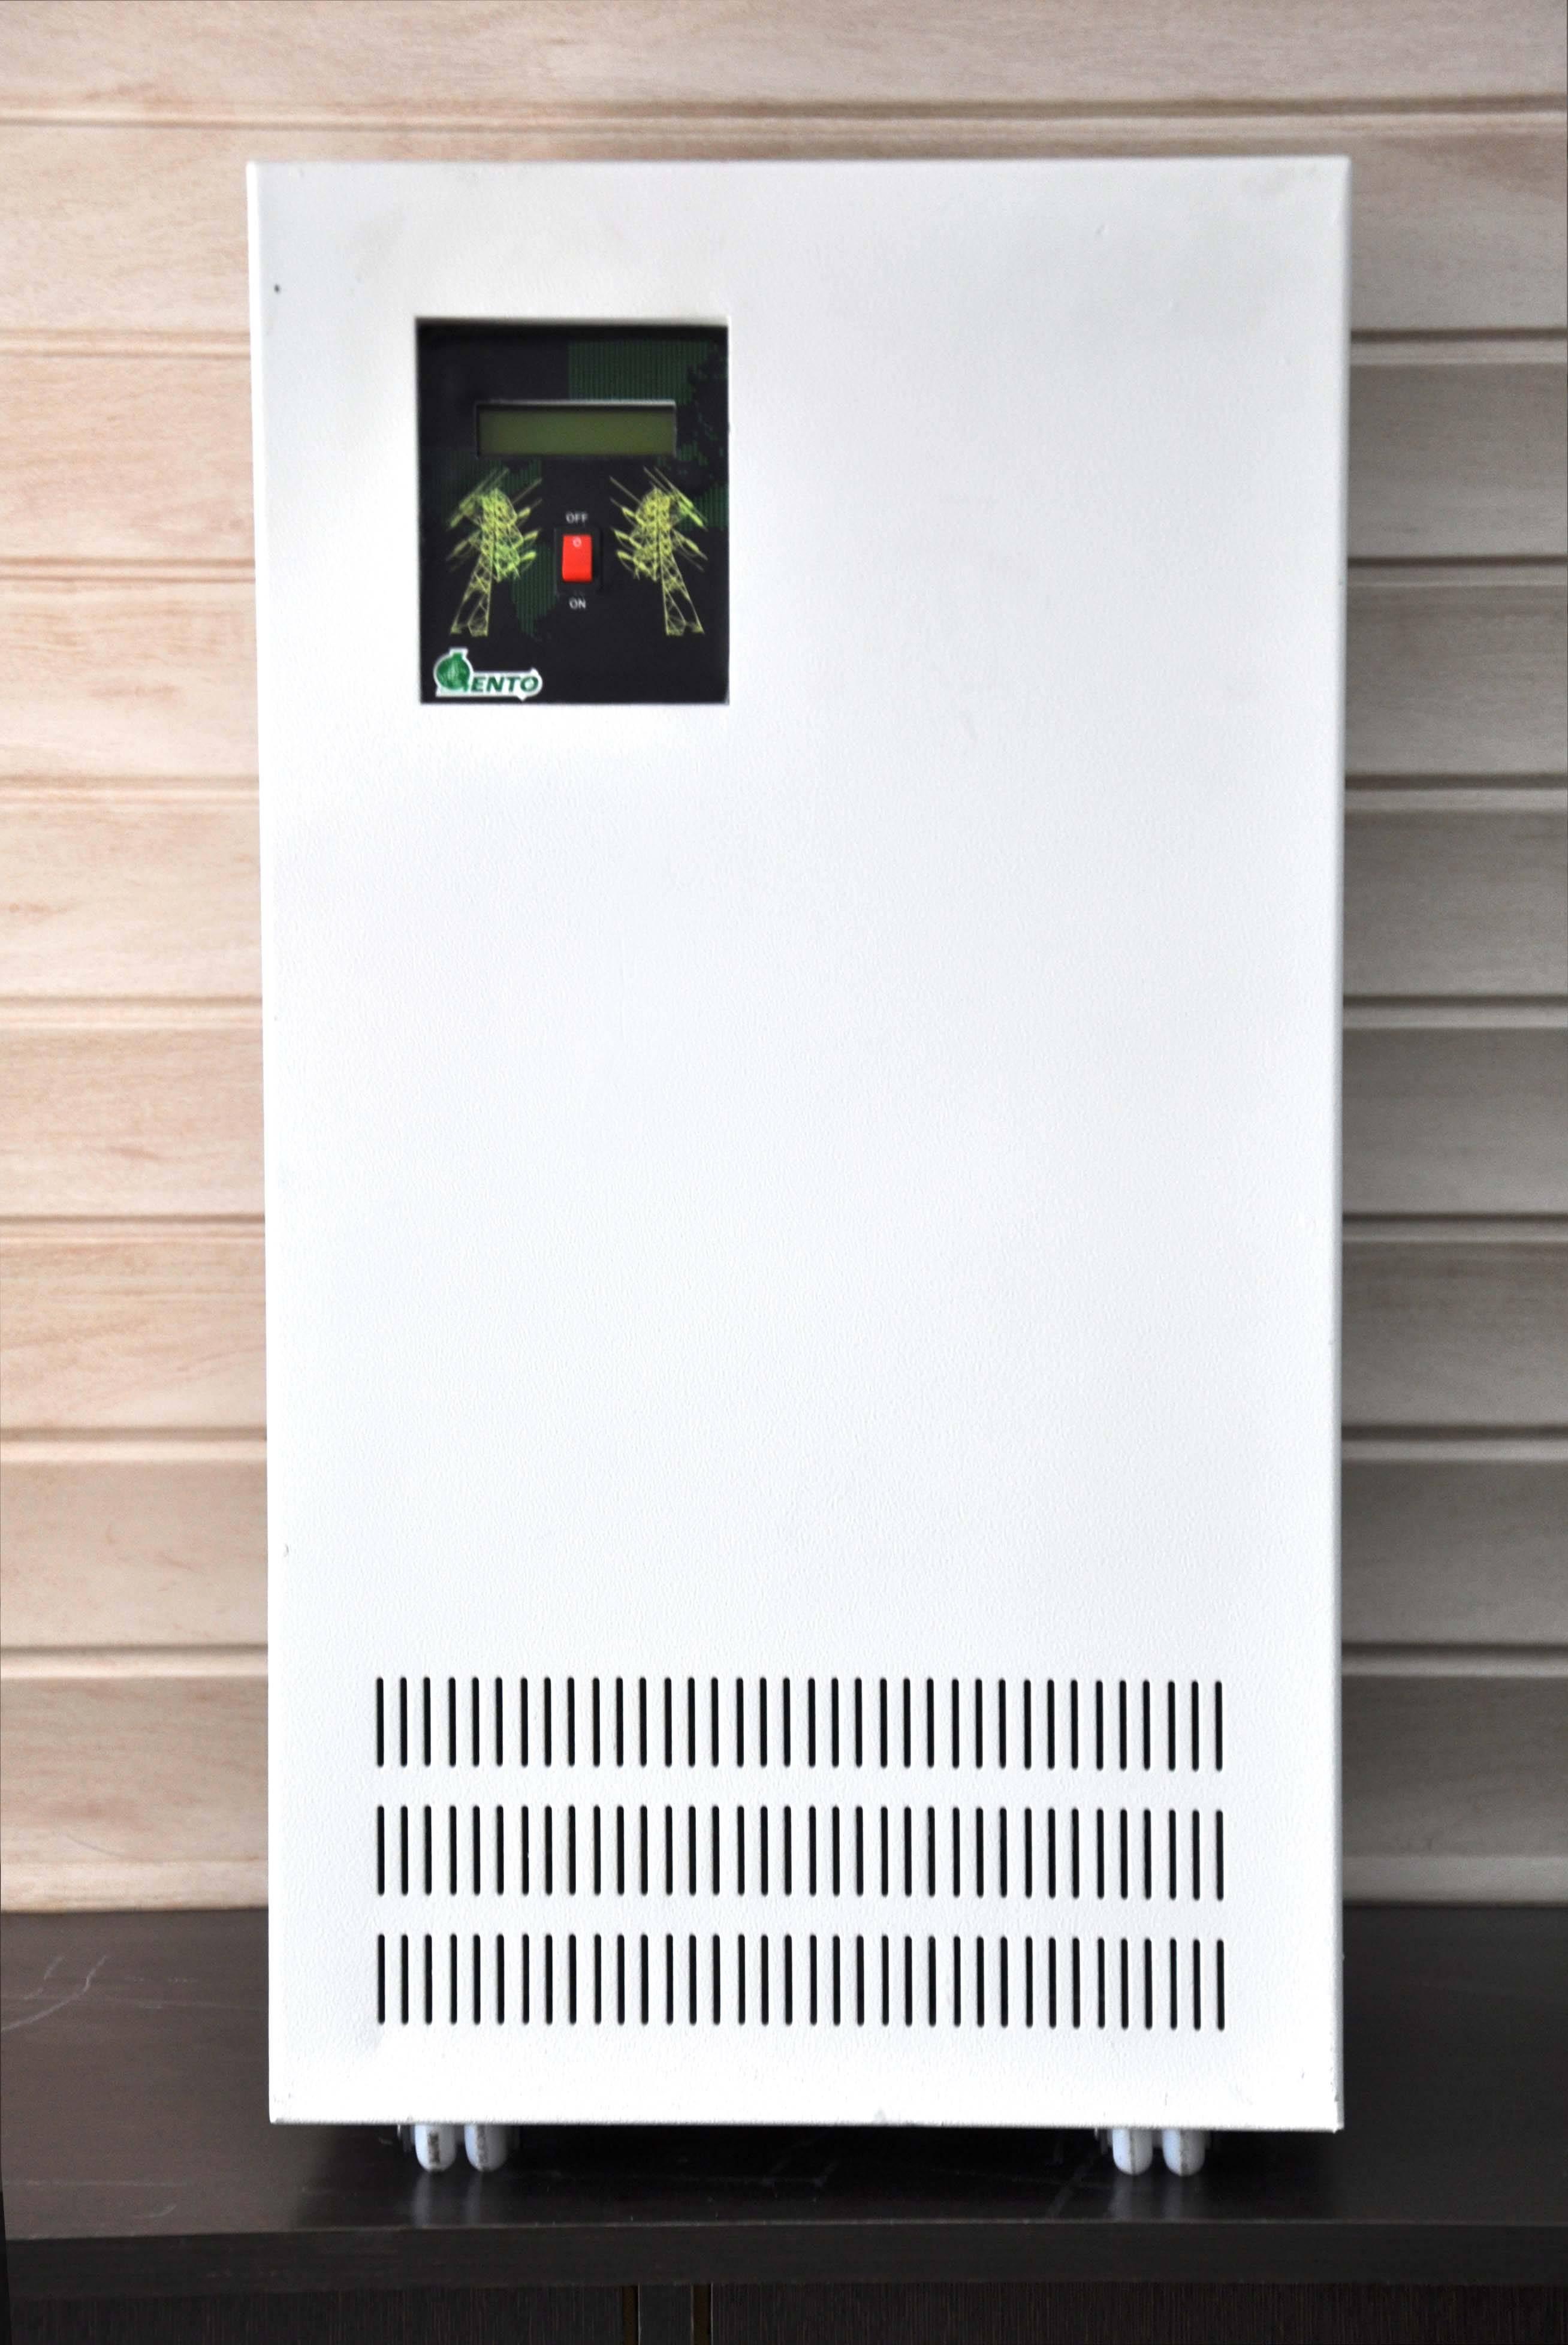 2.5KVA 36V DSP Pure Sine Wave Static Inverter